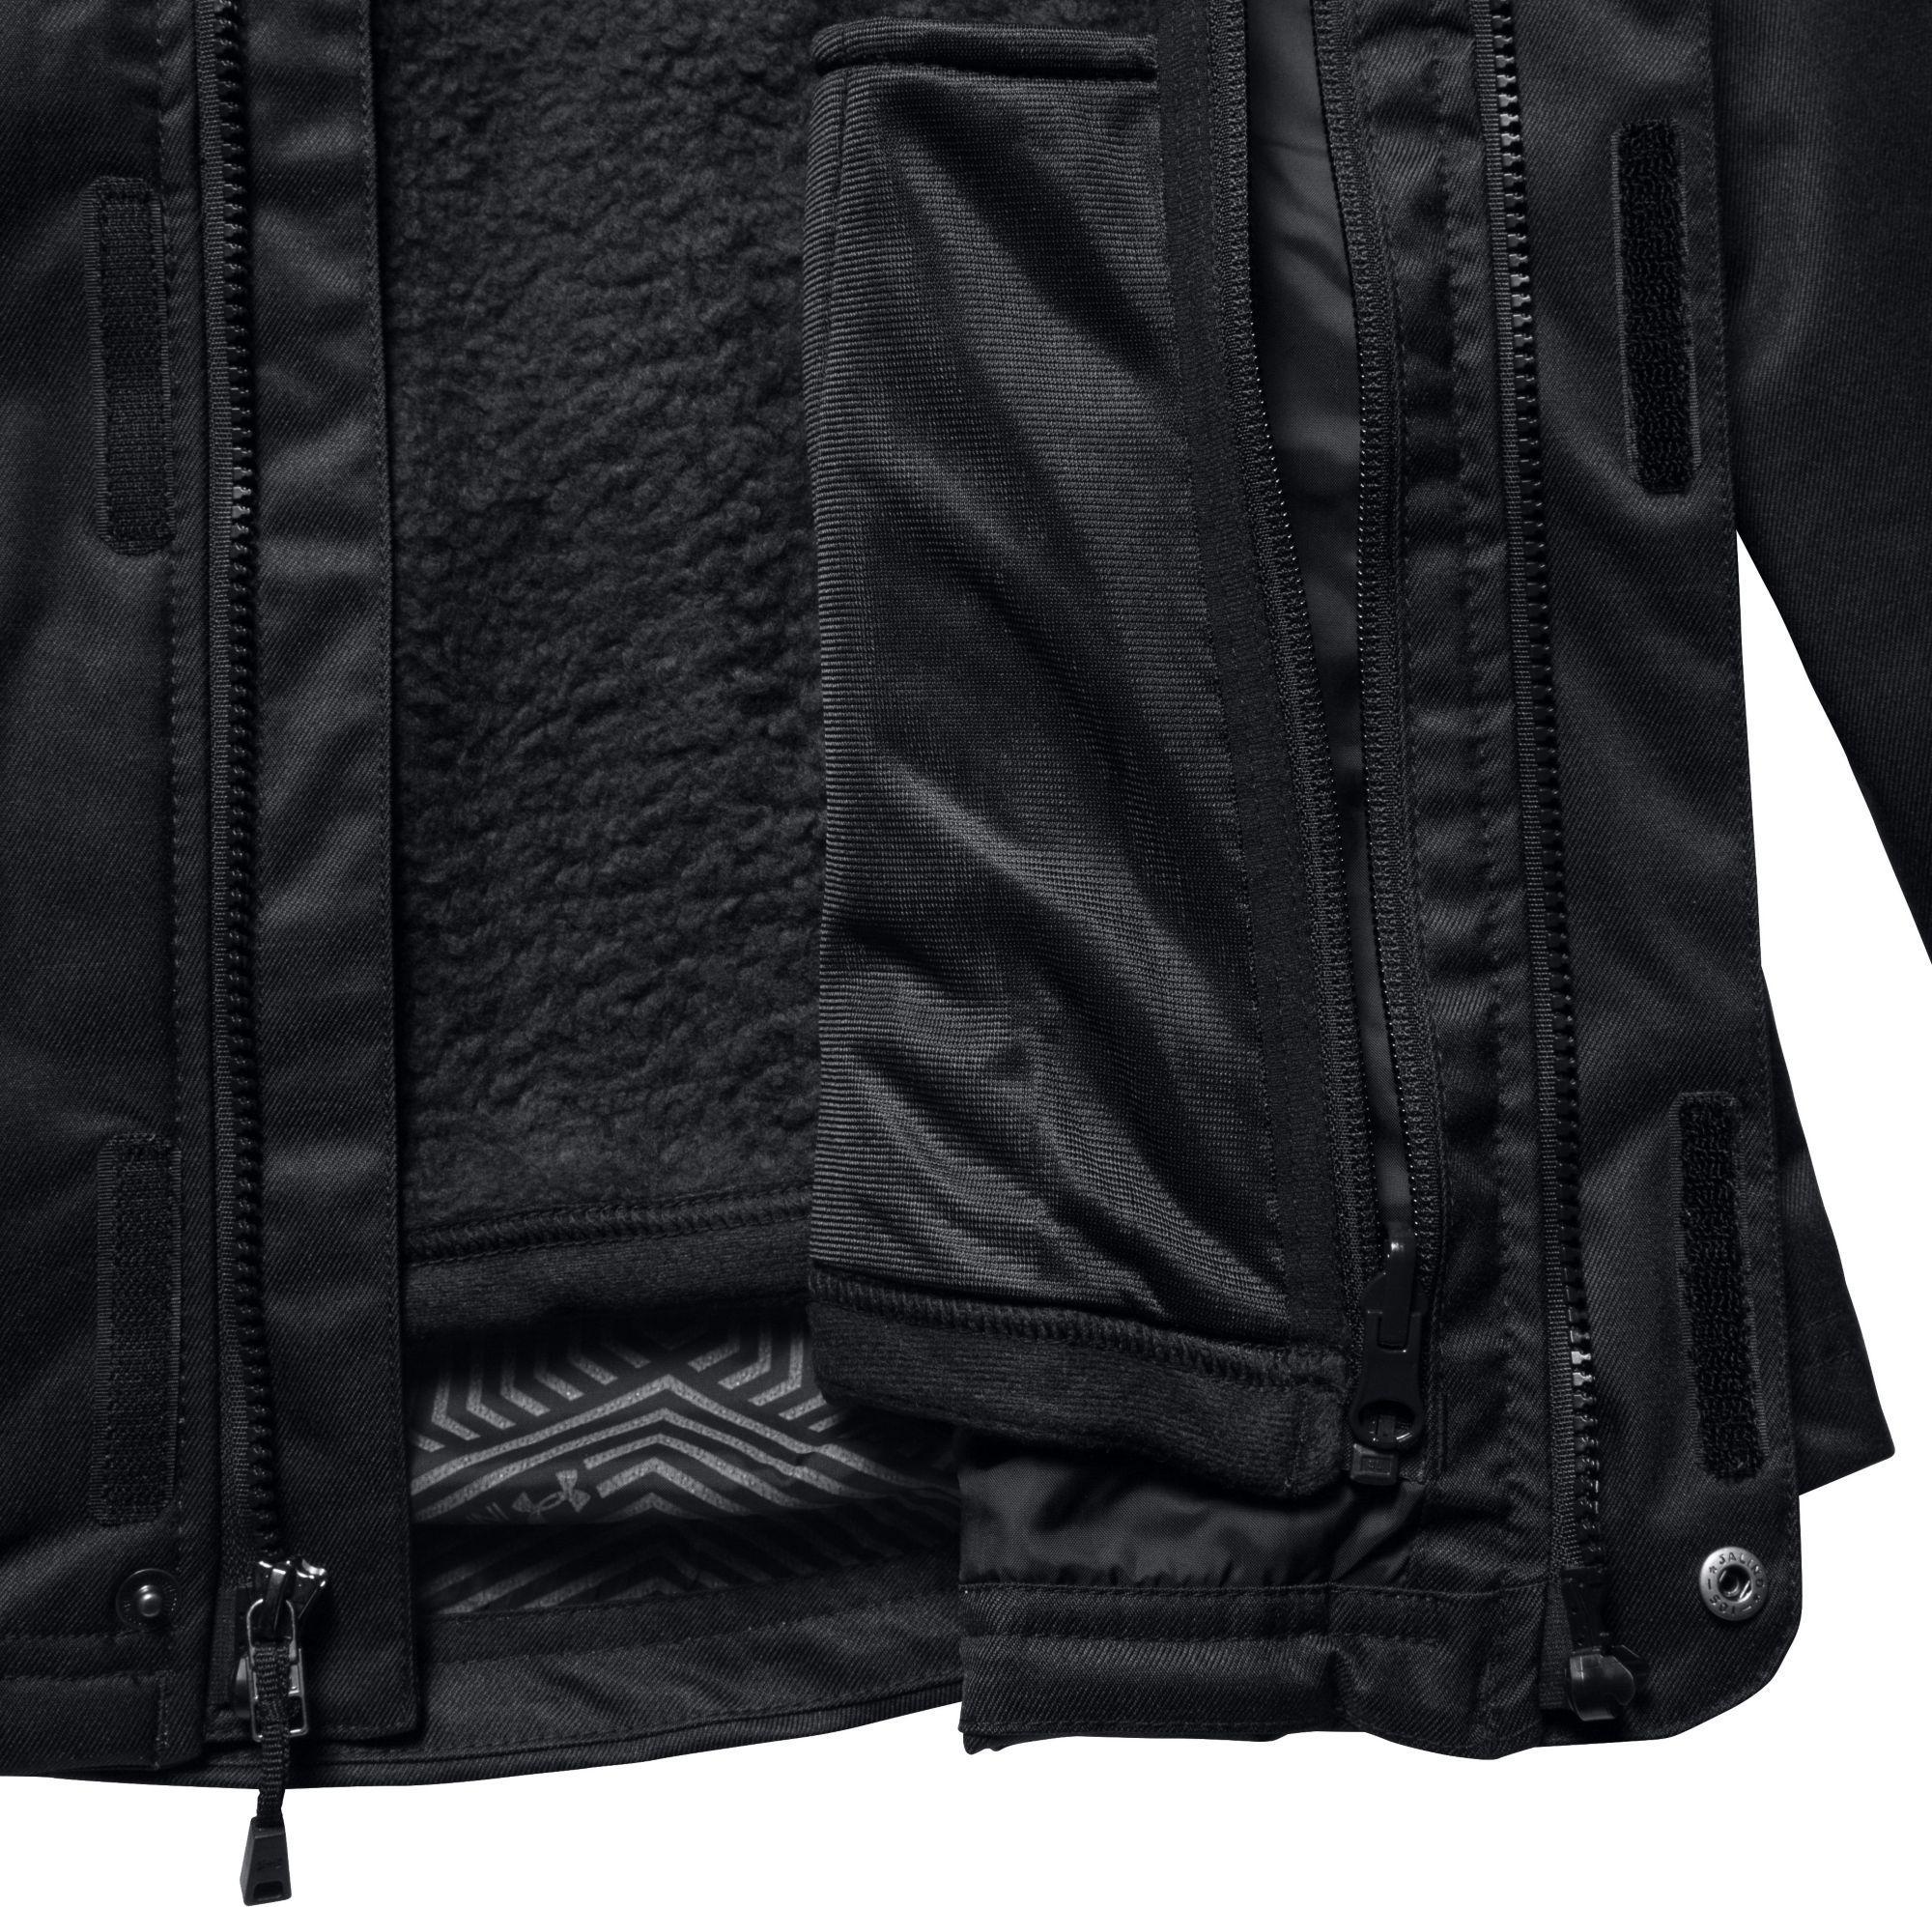 db760af0 Under Armour Black Coldgear Infrared Sienna 3-in-1 Jacket